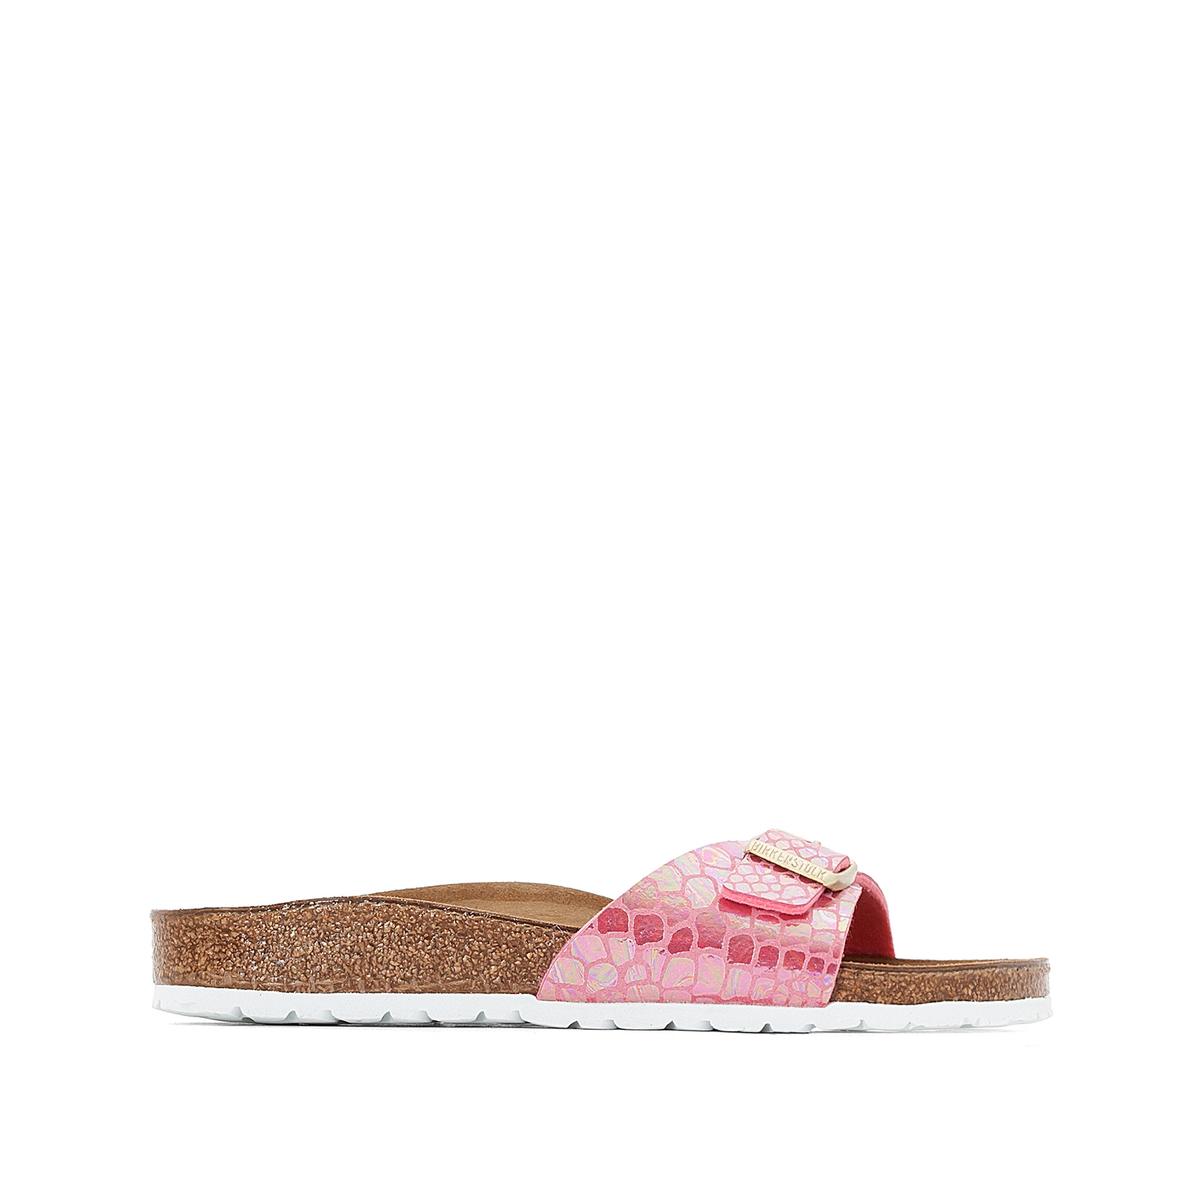 Туфли без задника с рисунком под кожу змеи MADRID